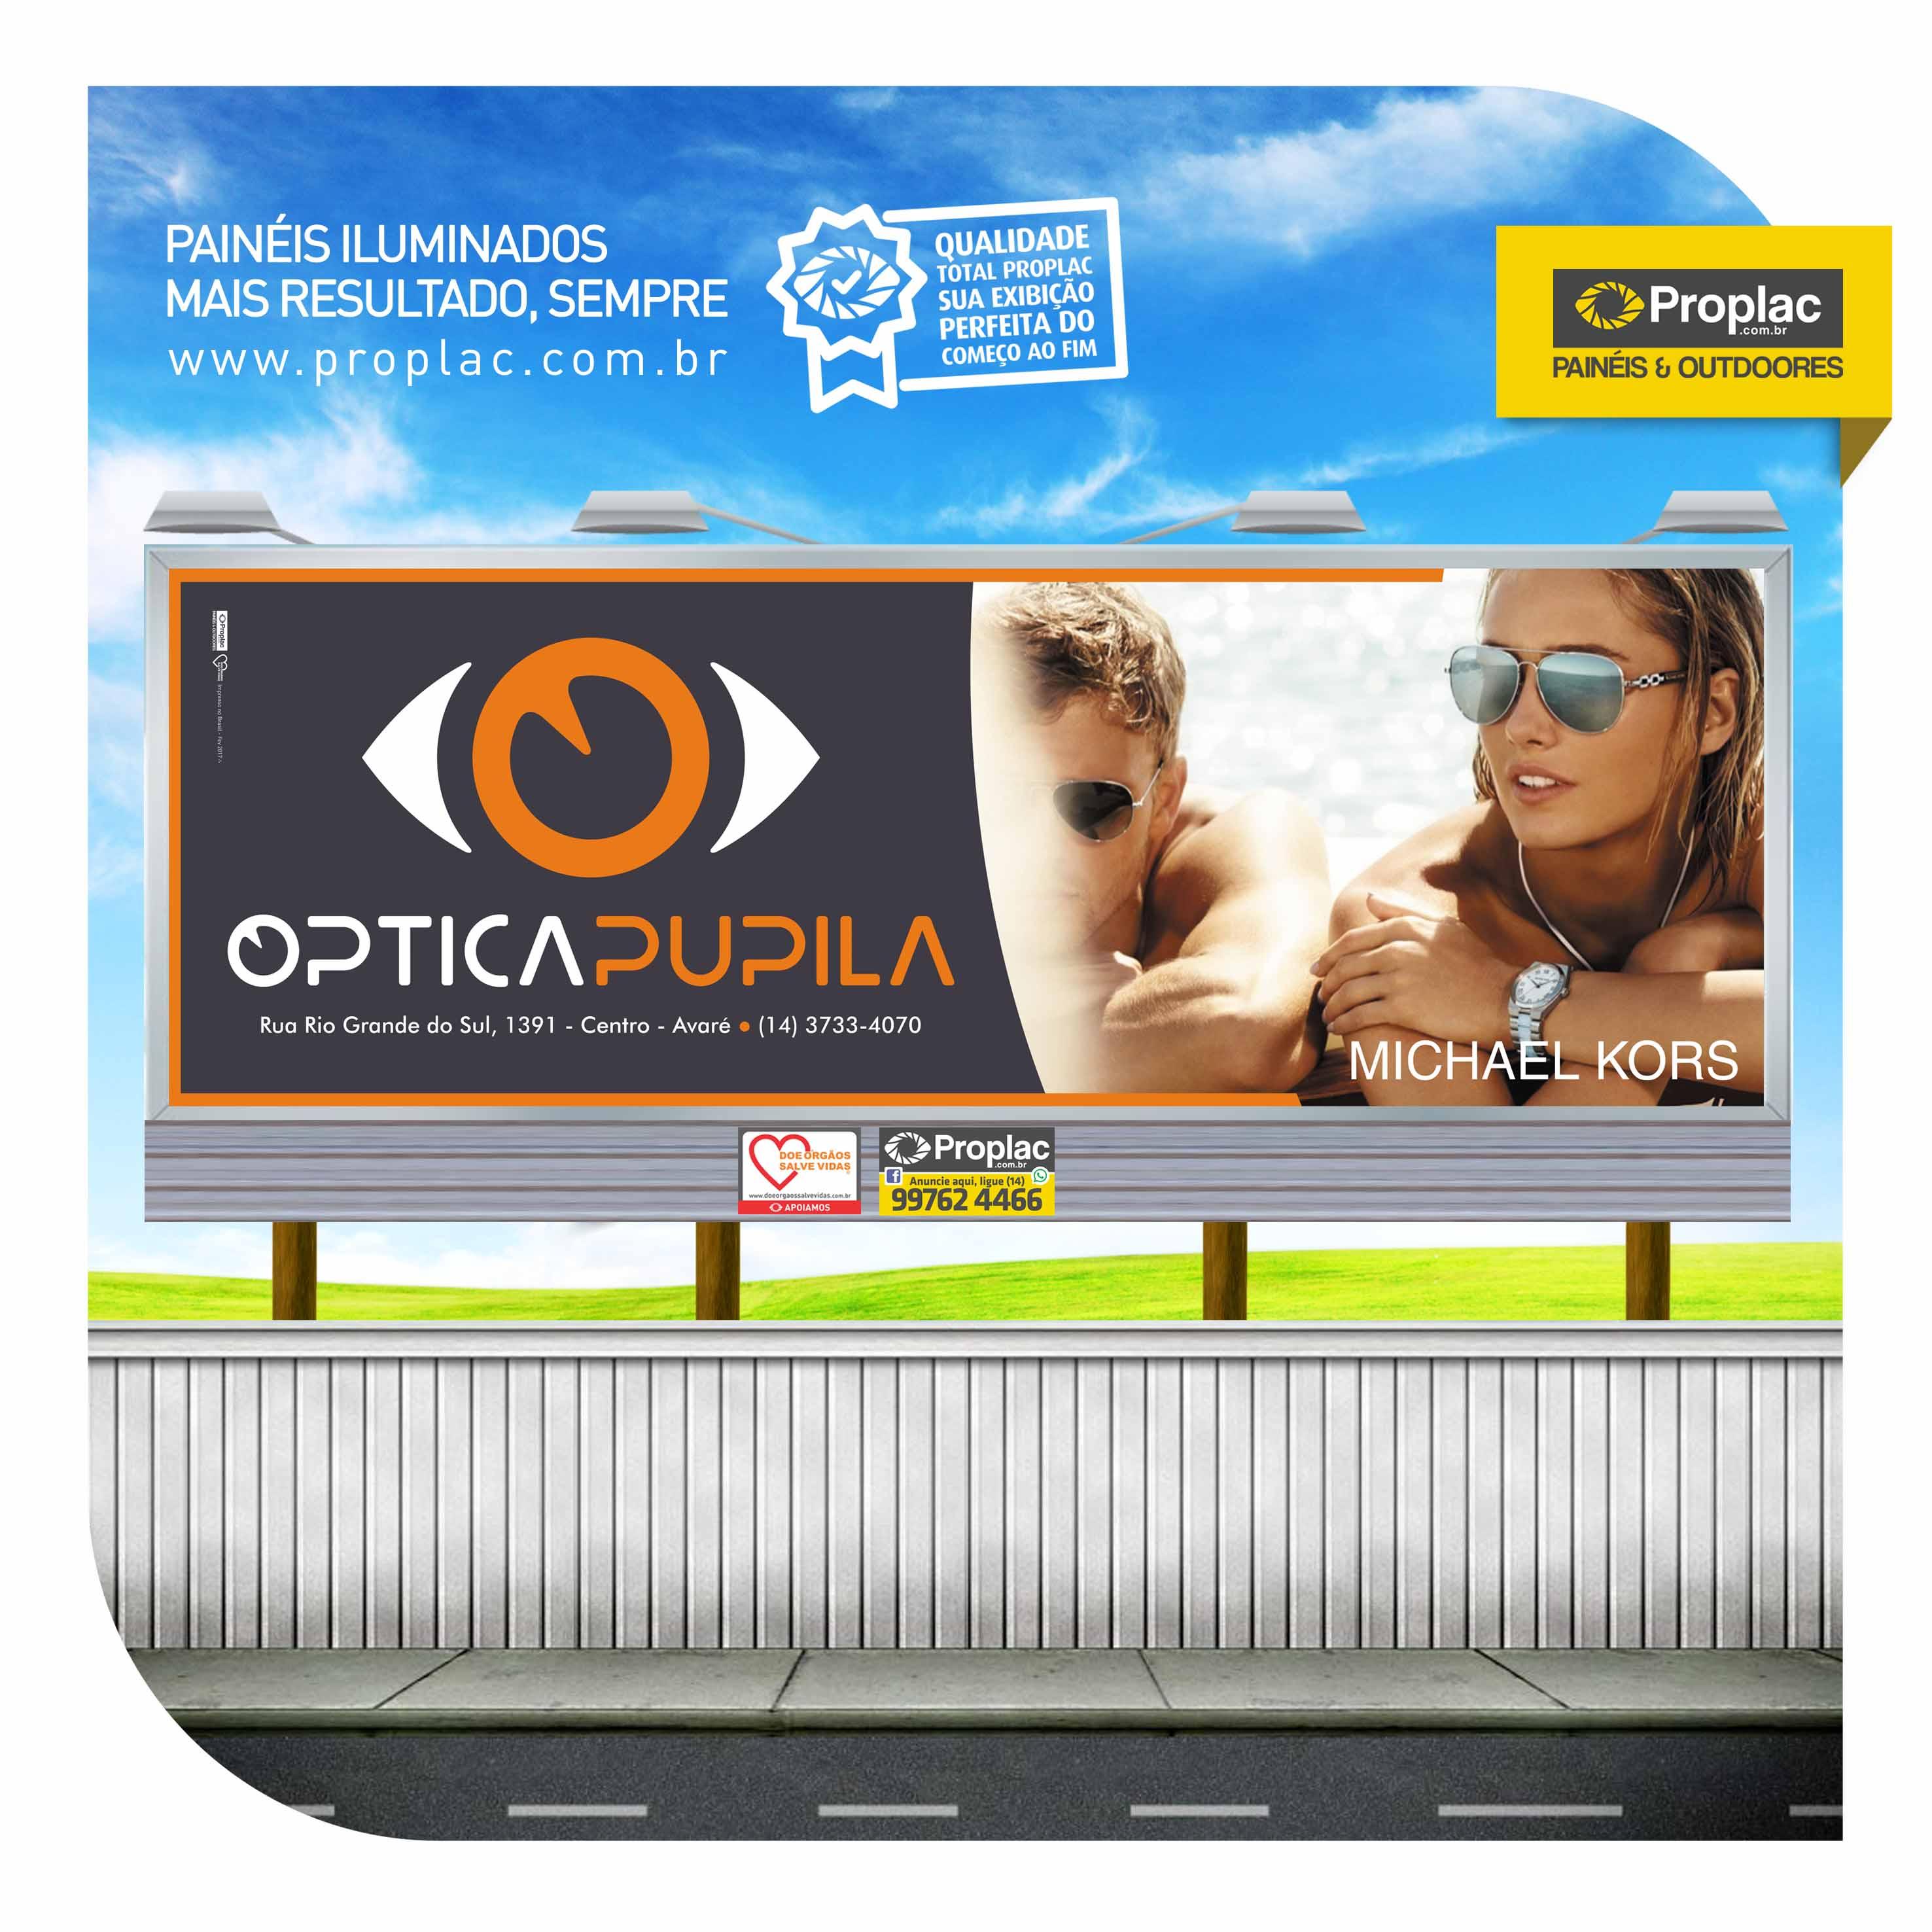 290c136523e8e ONDE FICA Óptica Pupila Rua Rio Grande do Sul